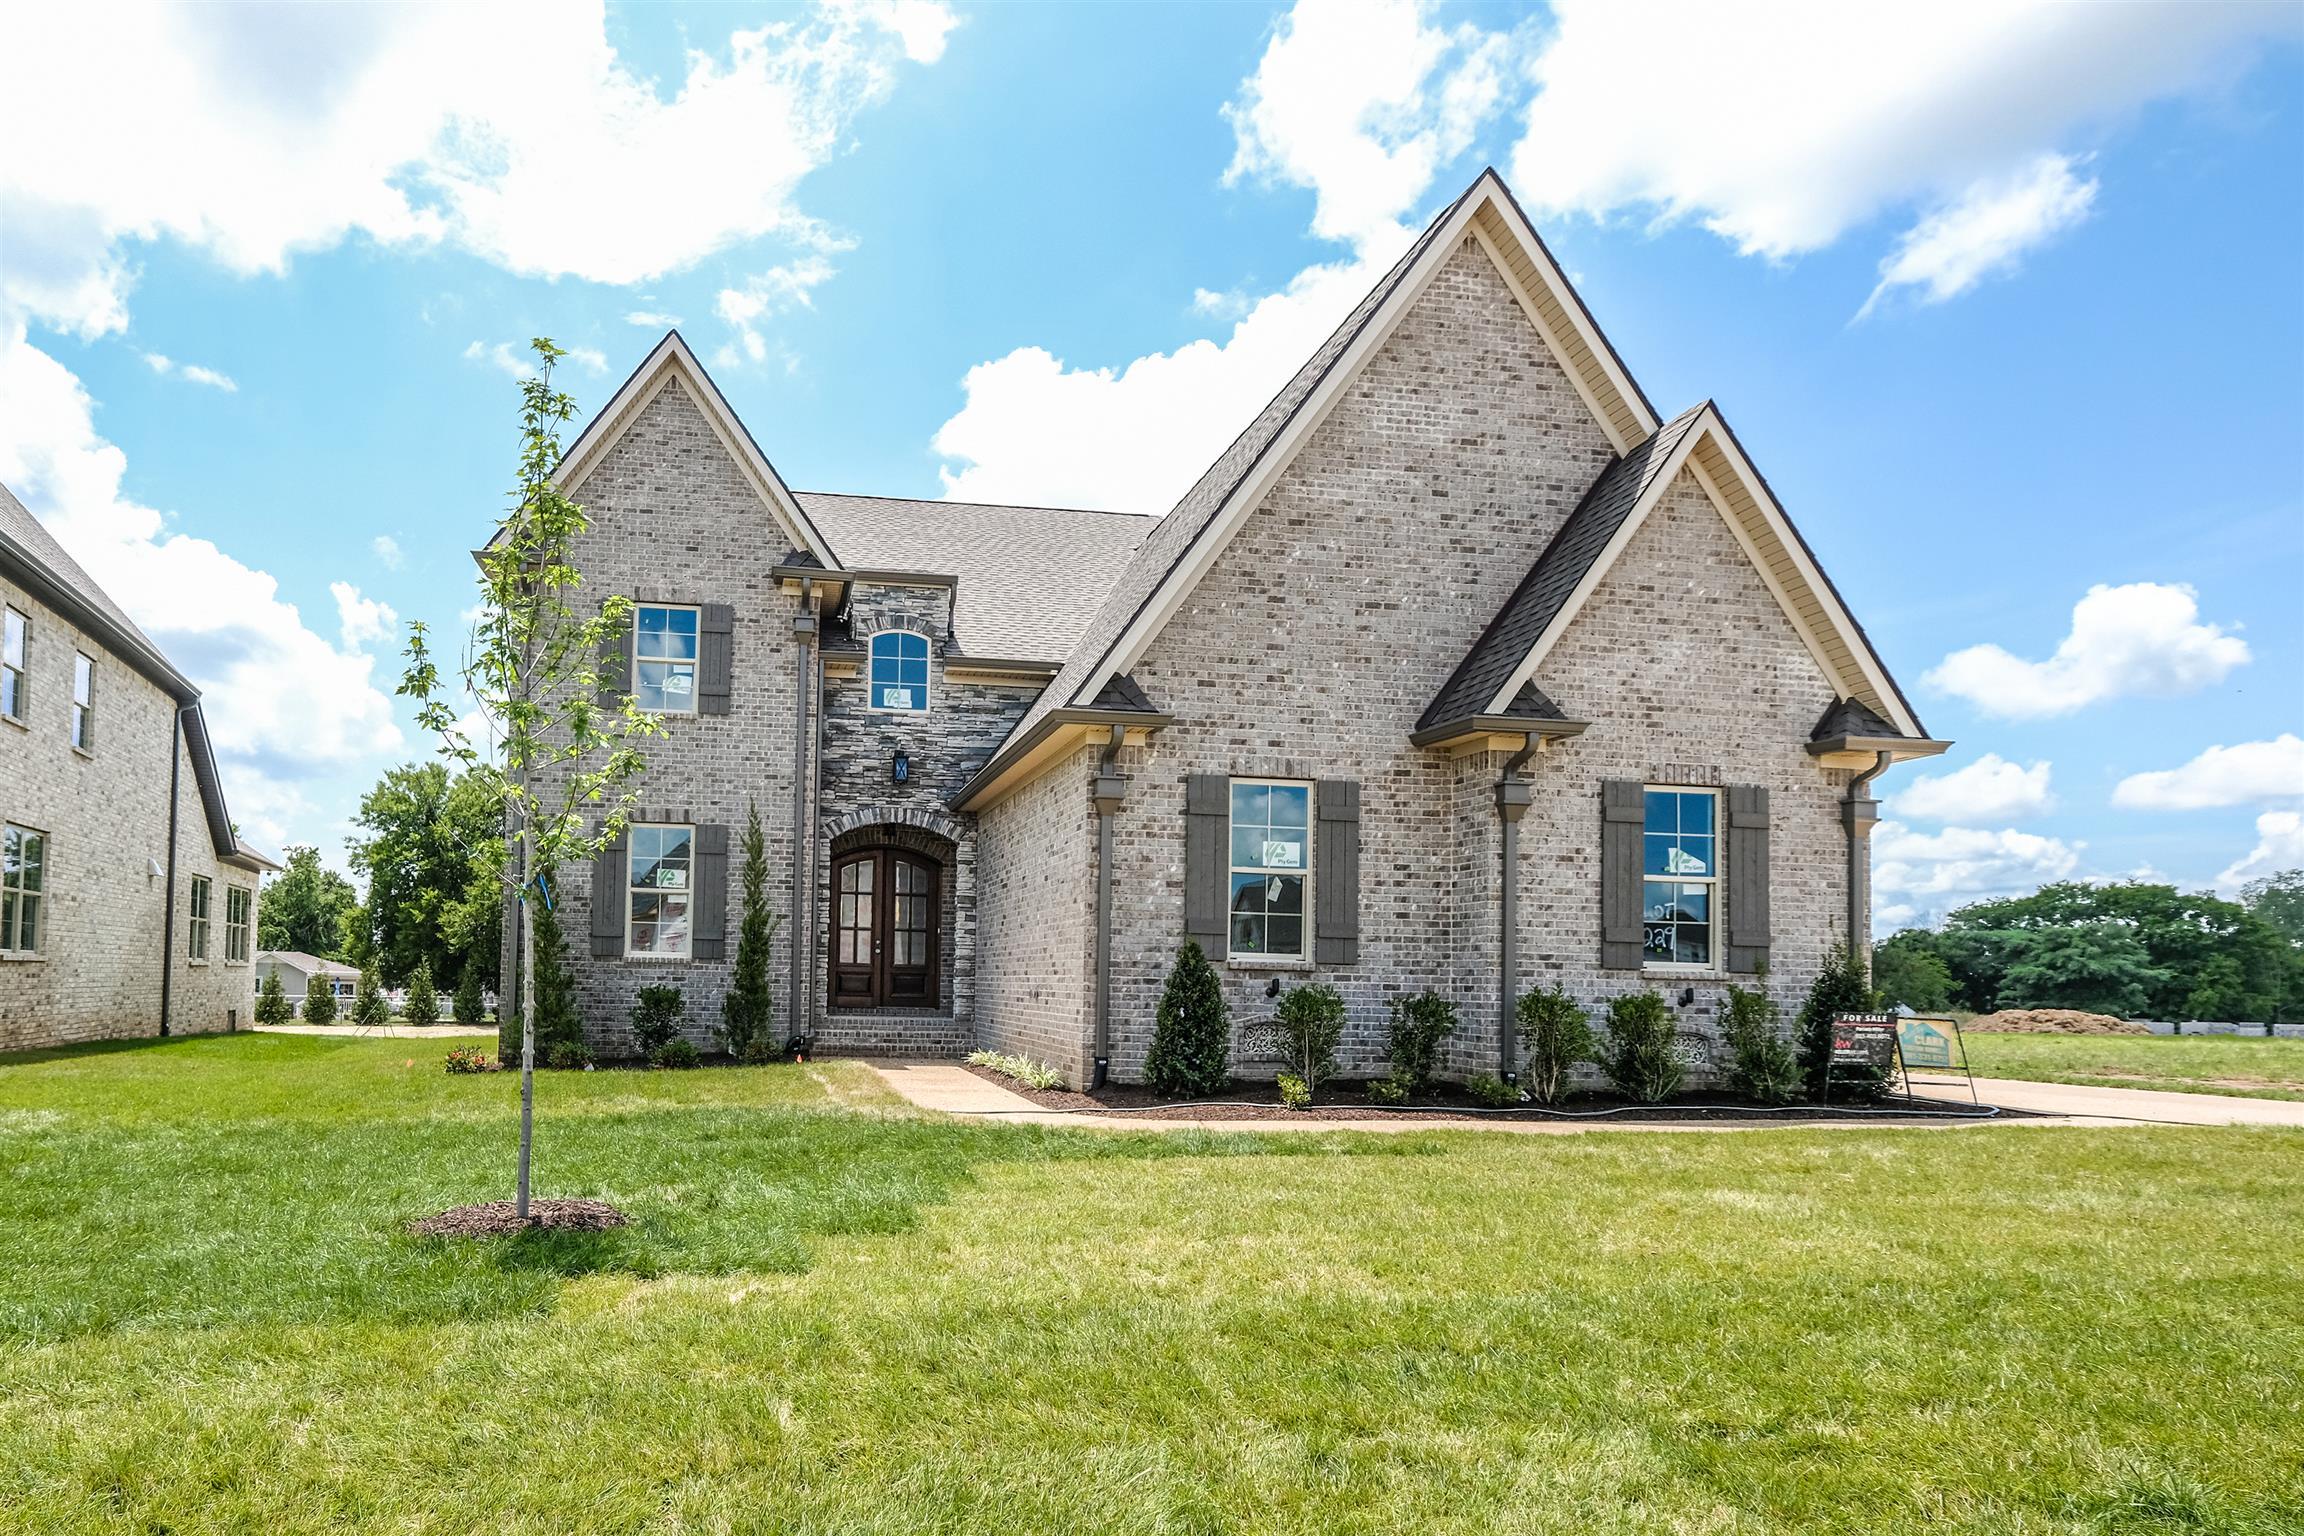 2039 Autumn Ridge Way (Lot 229), Spring Hill, TN 37174 - Spring Hill, TN real estate listing